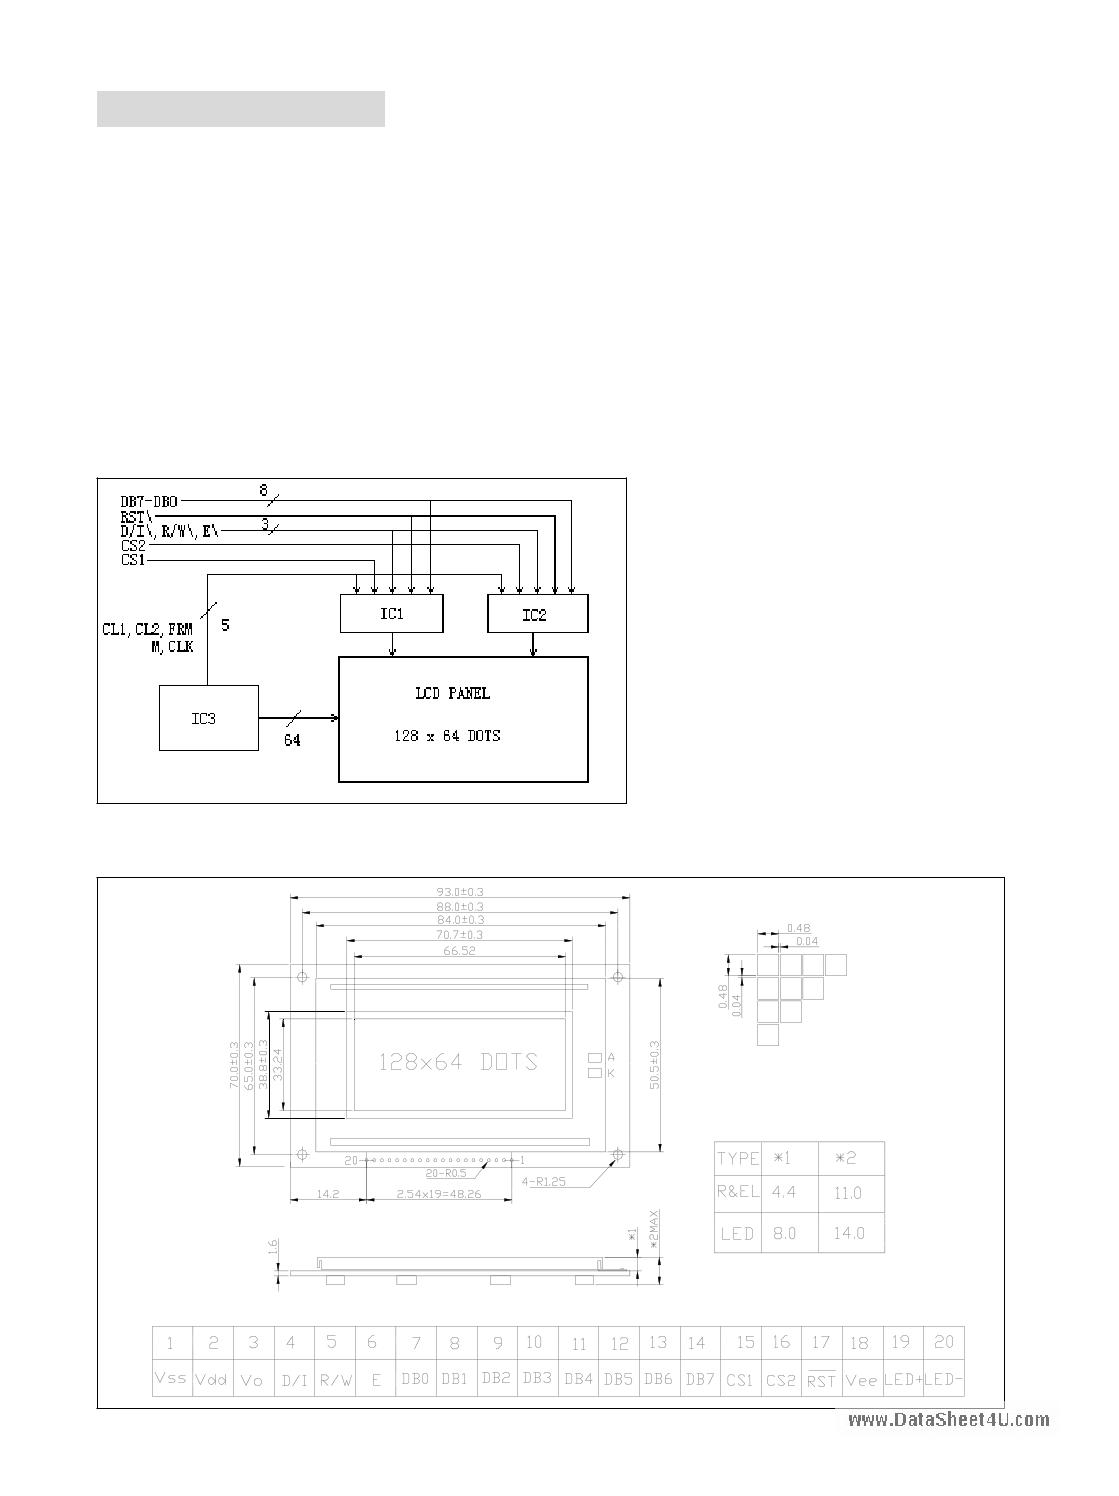 JHD12864E image